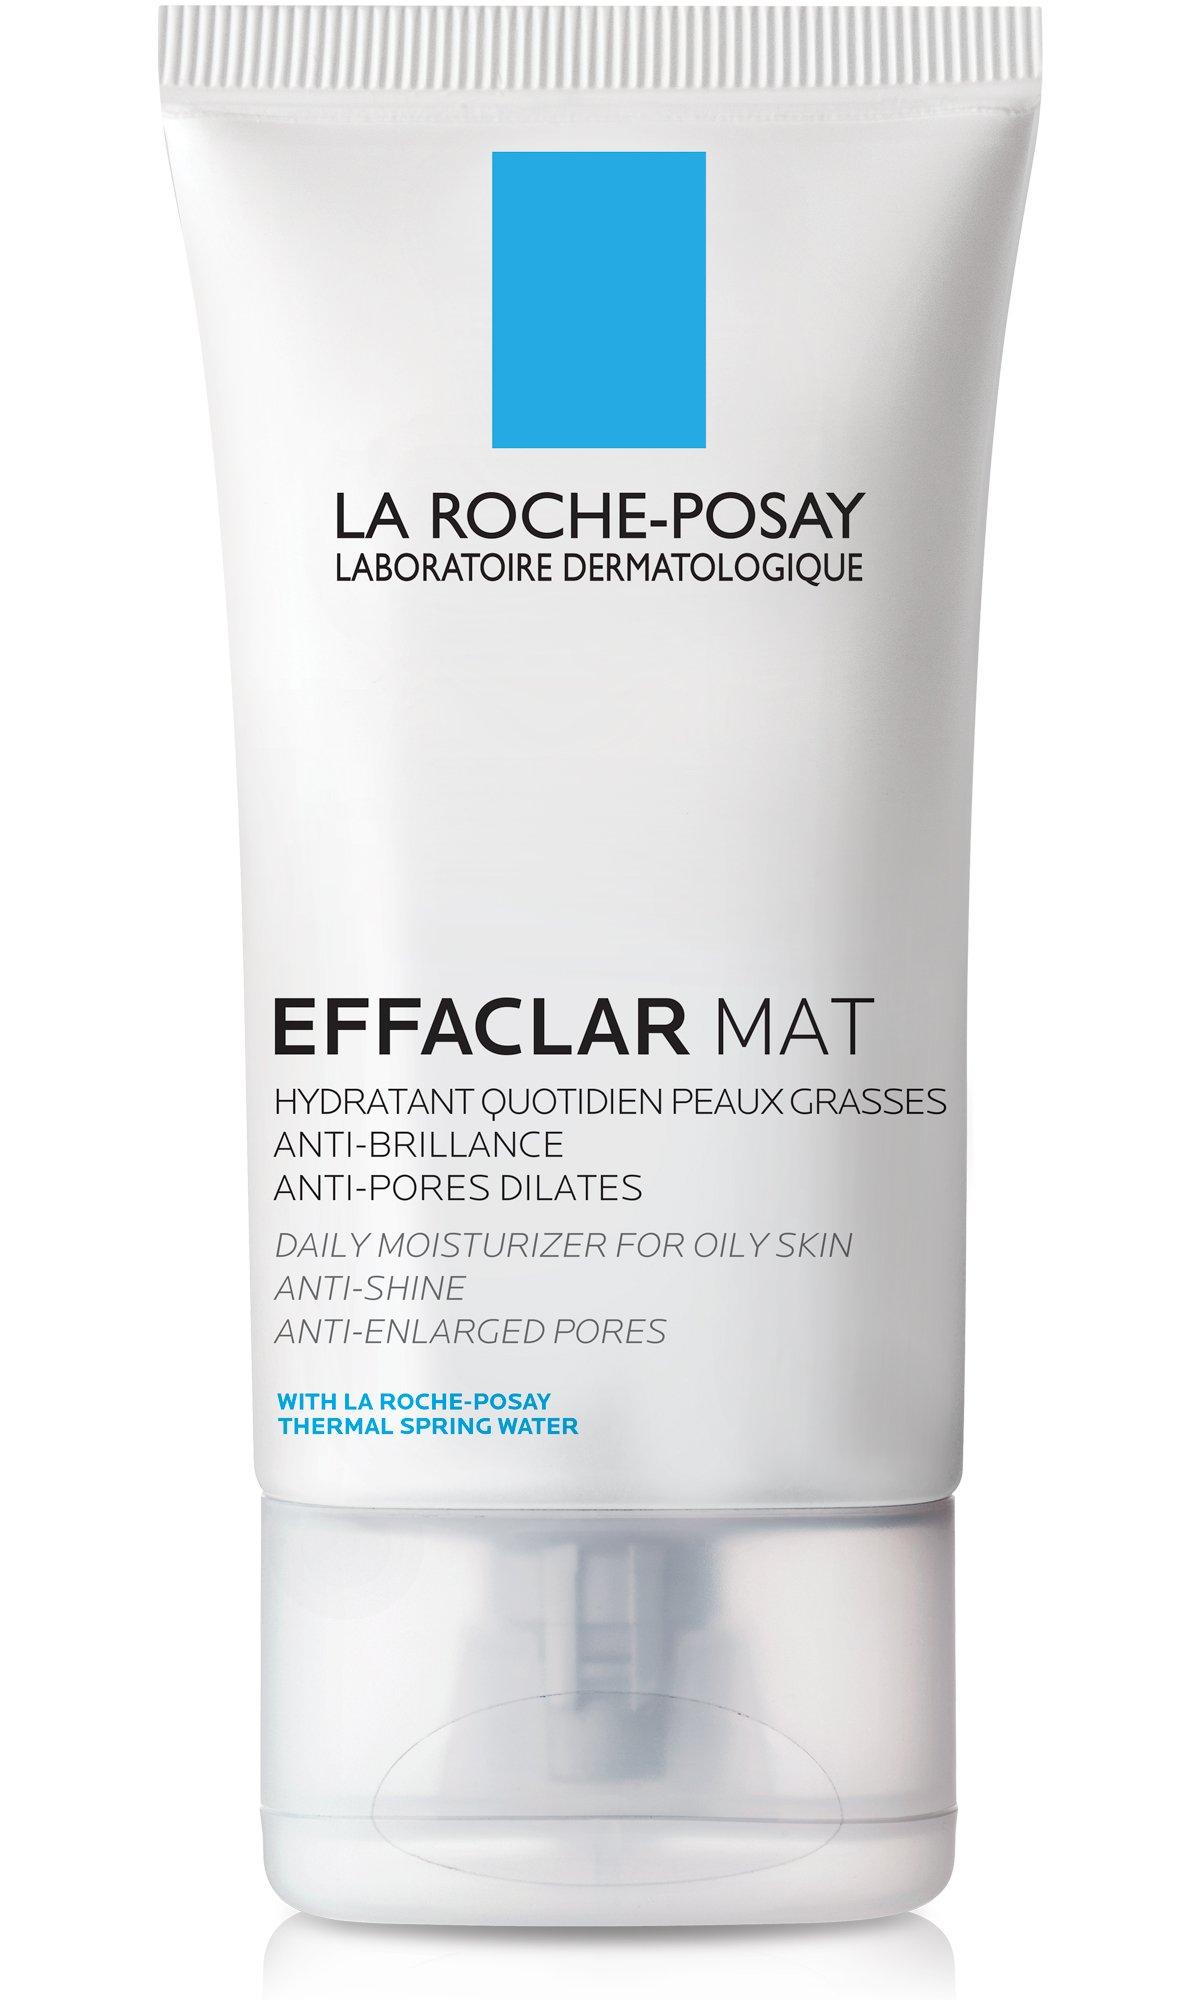 La Roche-Posay Effaclar Mat Face Moisturizer for Oily Skin, 1.35 Fl. Oz. by La Roche-Posay